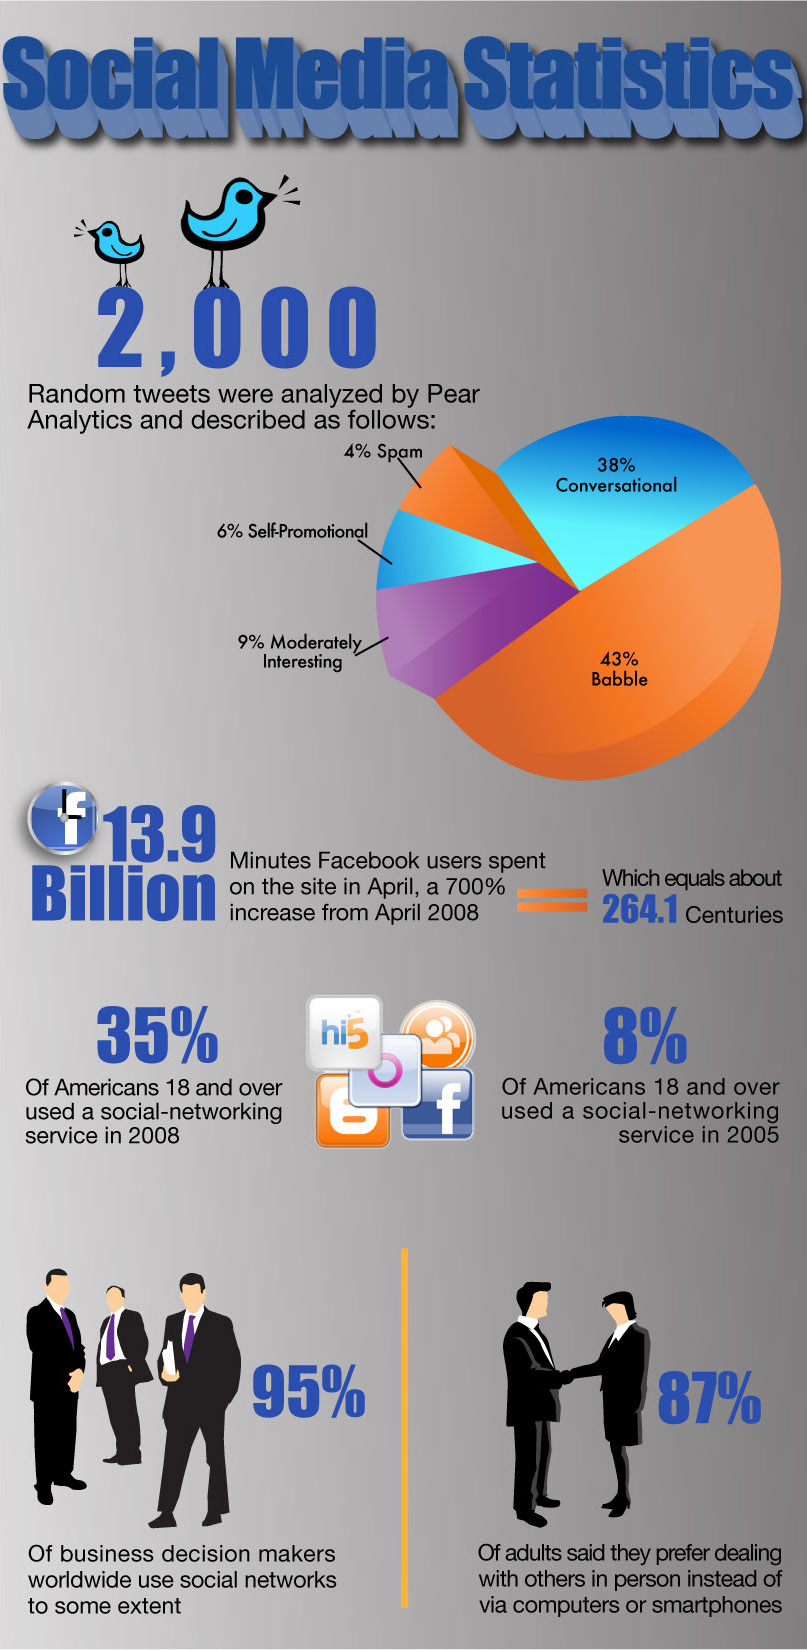 Enkele feitjes en cijfers van social media gebruik in beeld gebracht: